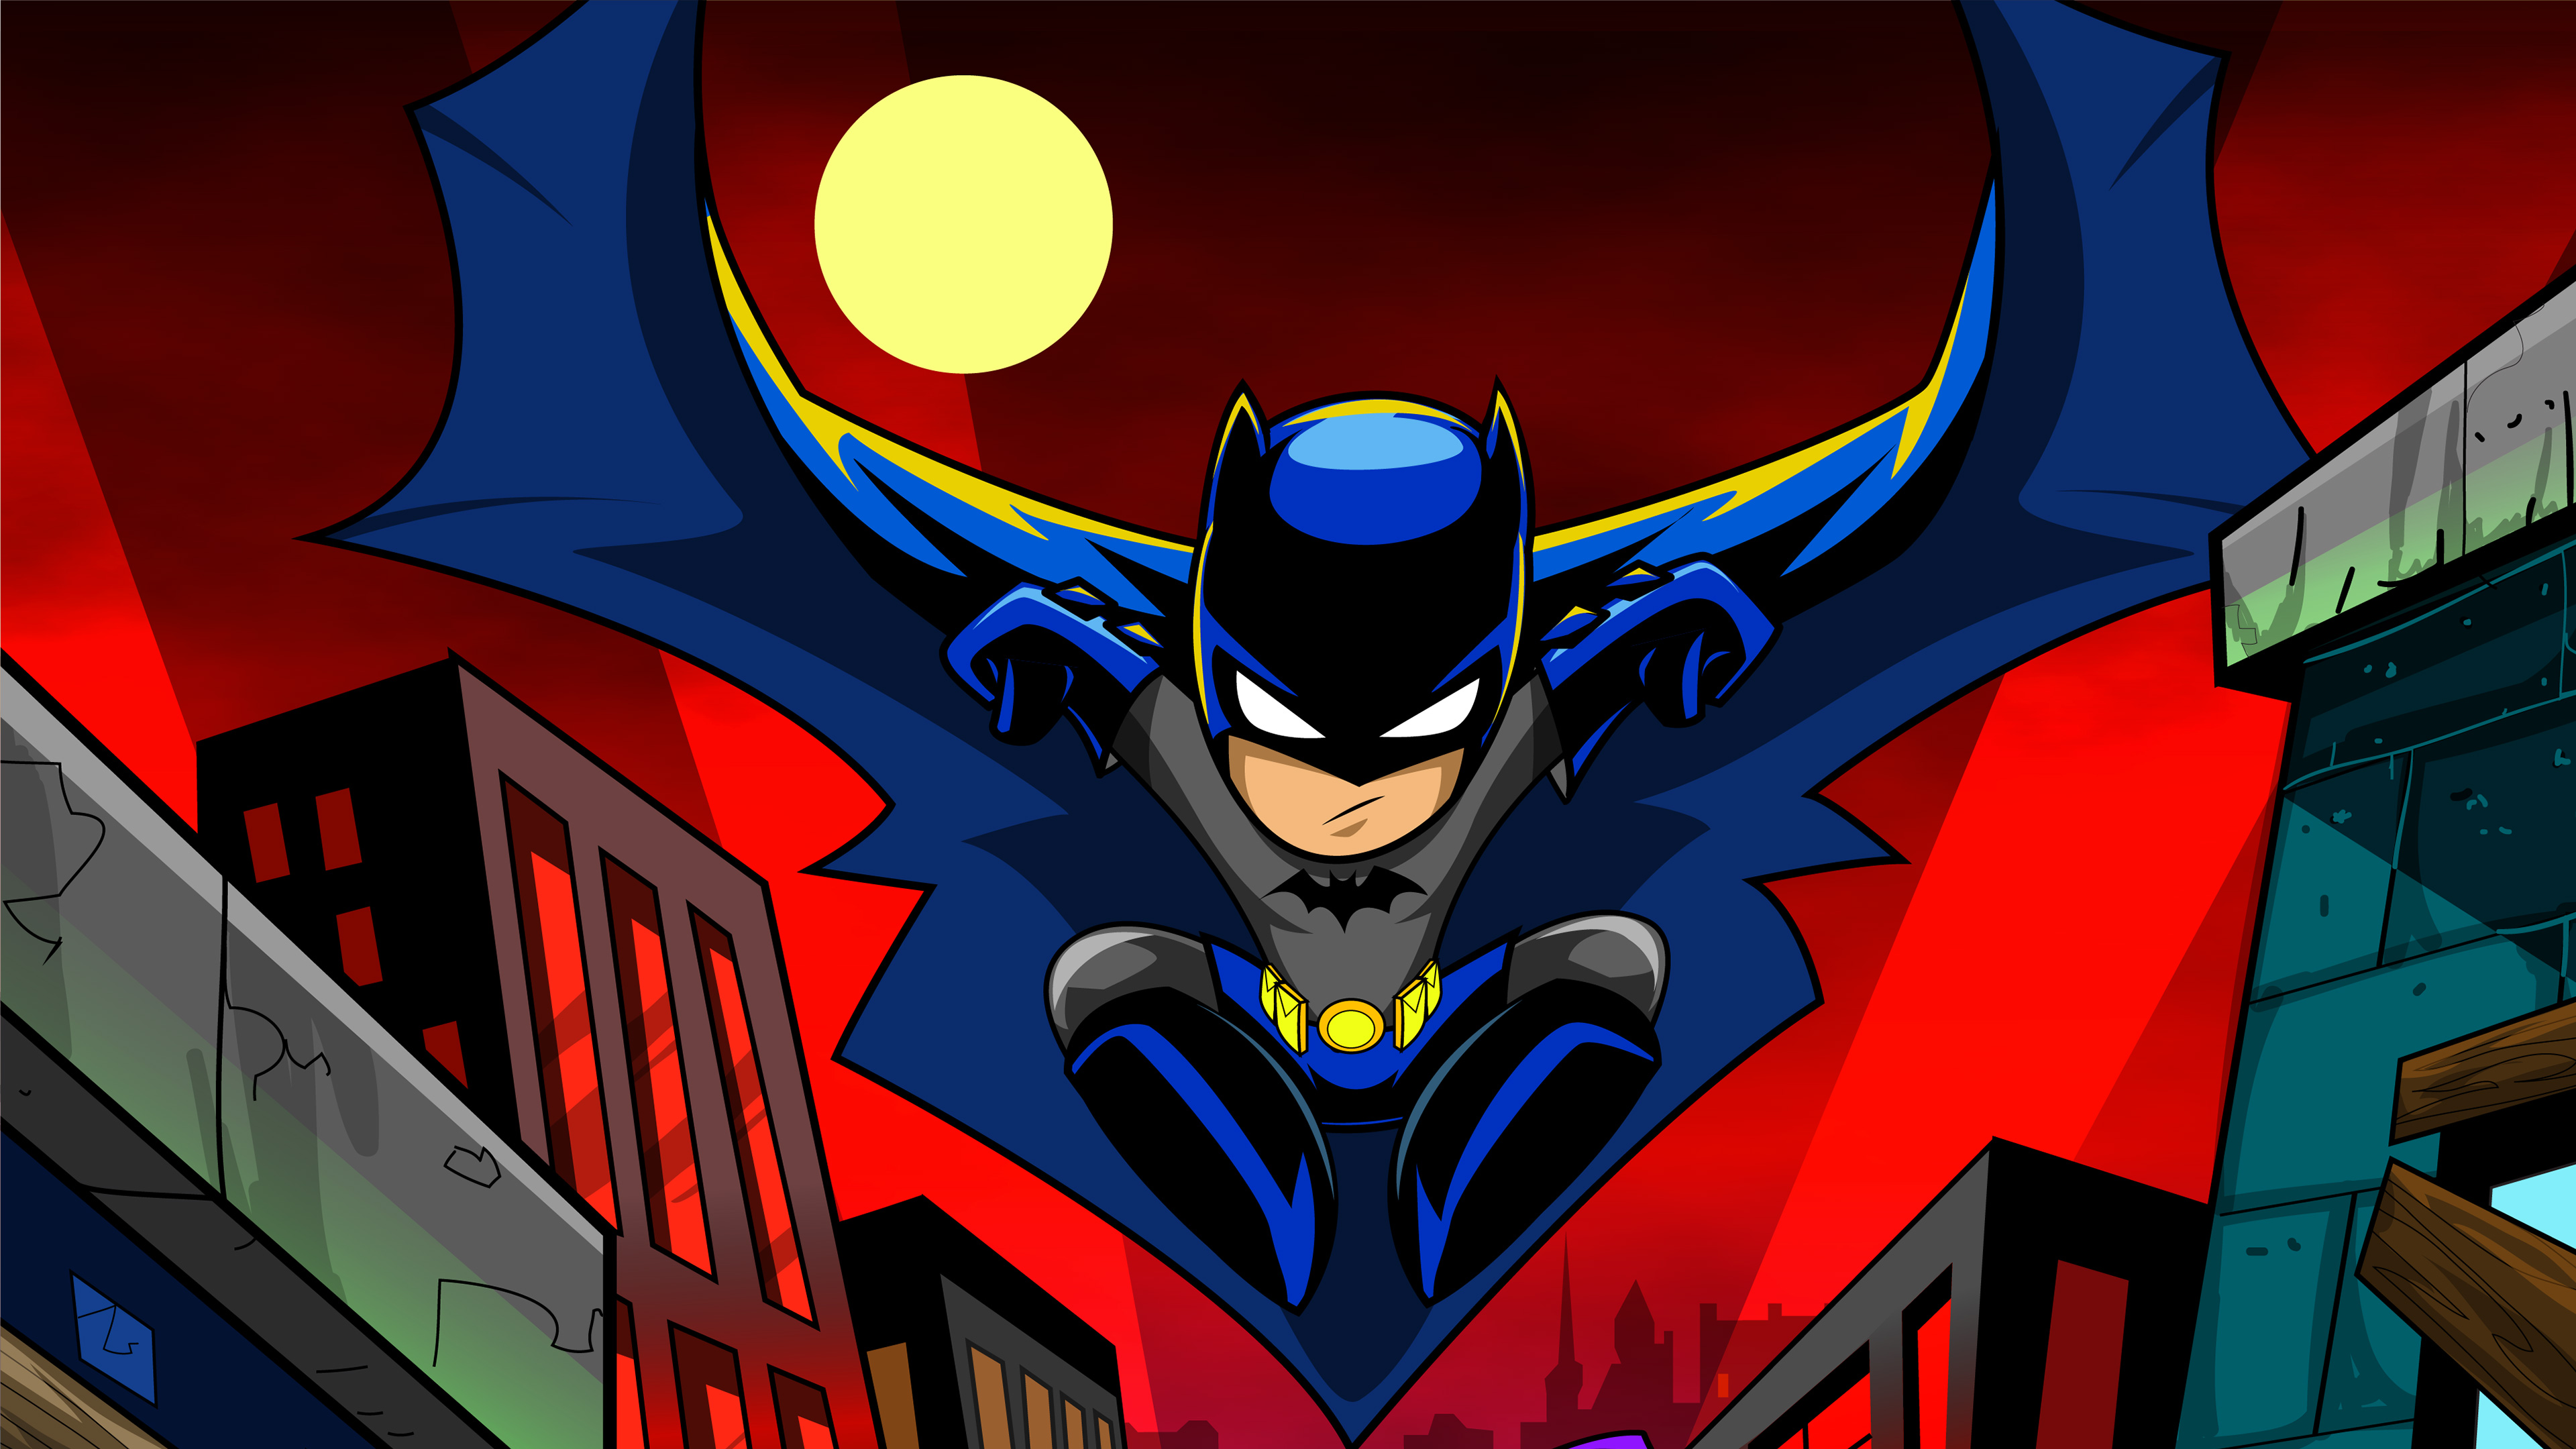 Batman Cartoon Art 4k, HD Superheroes, 4k Wallpapers ...